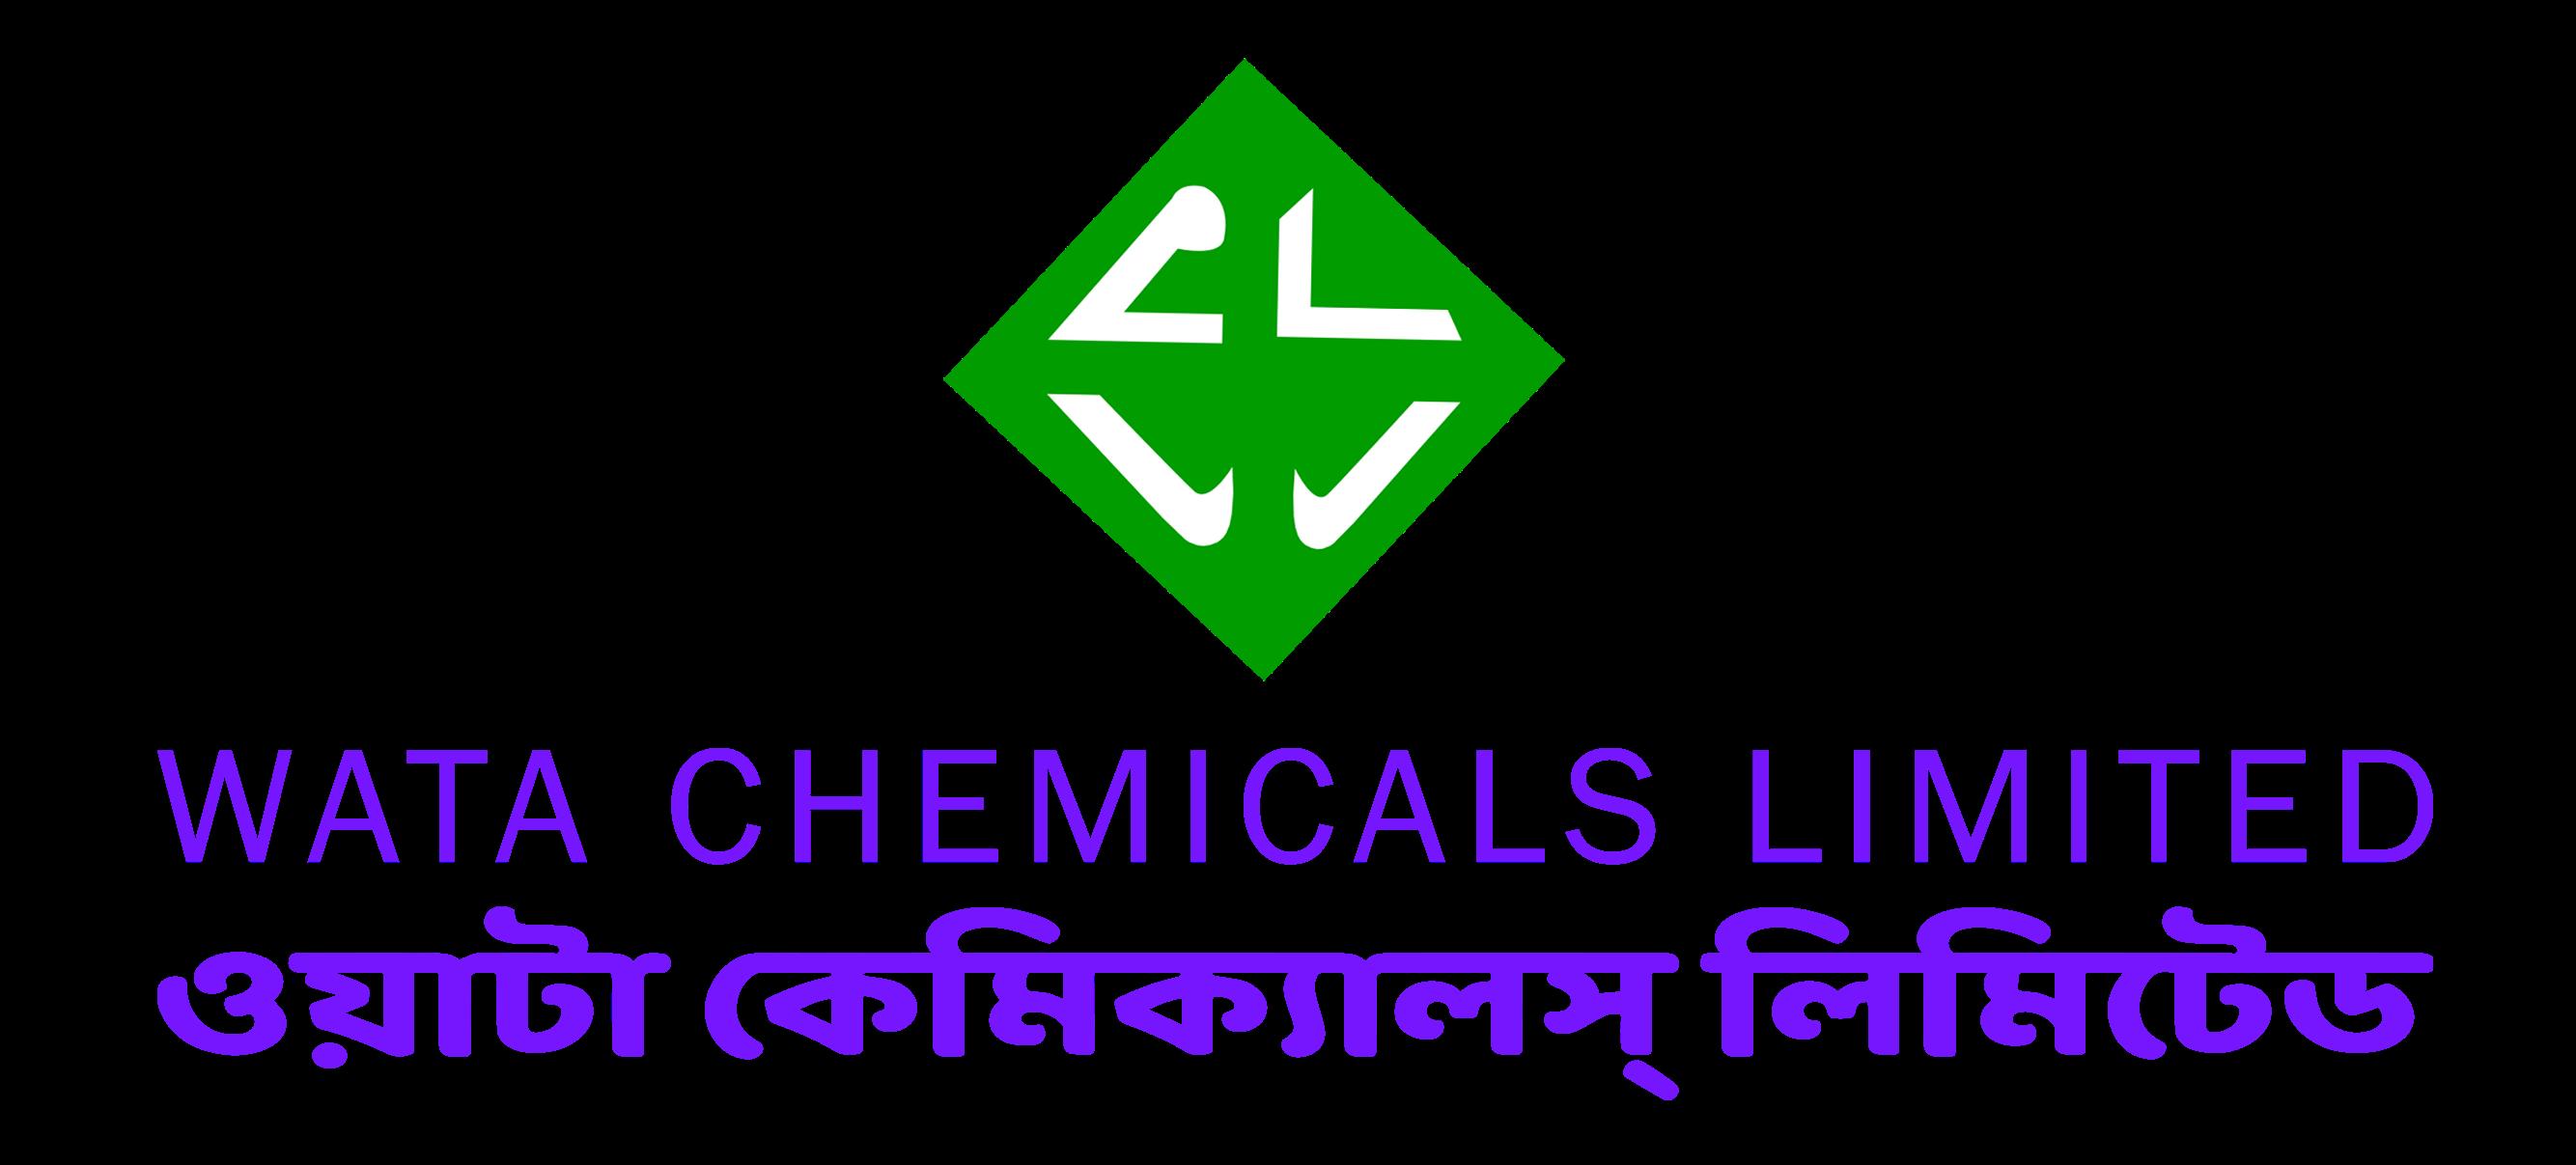 Wata Chemicals